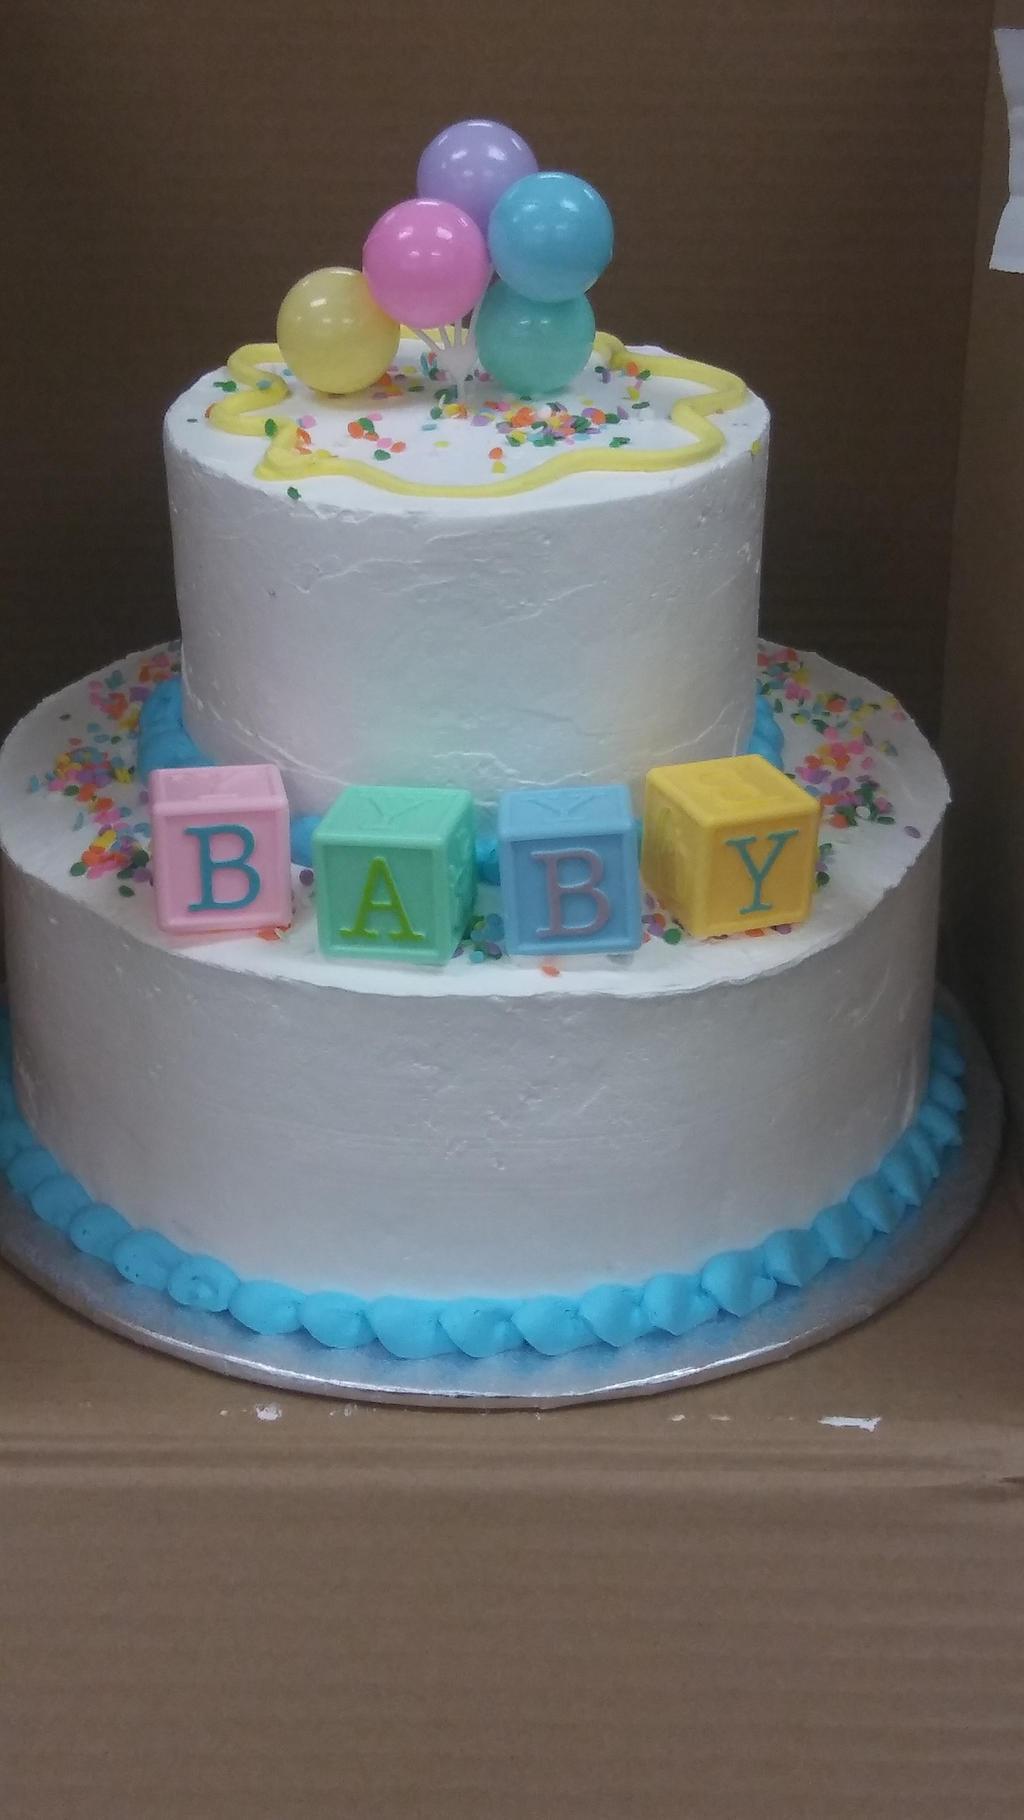 Baby shower cake by AuraLeighDragon